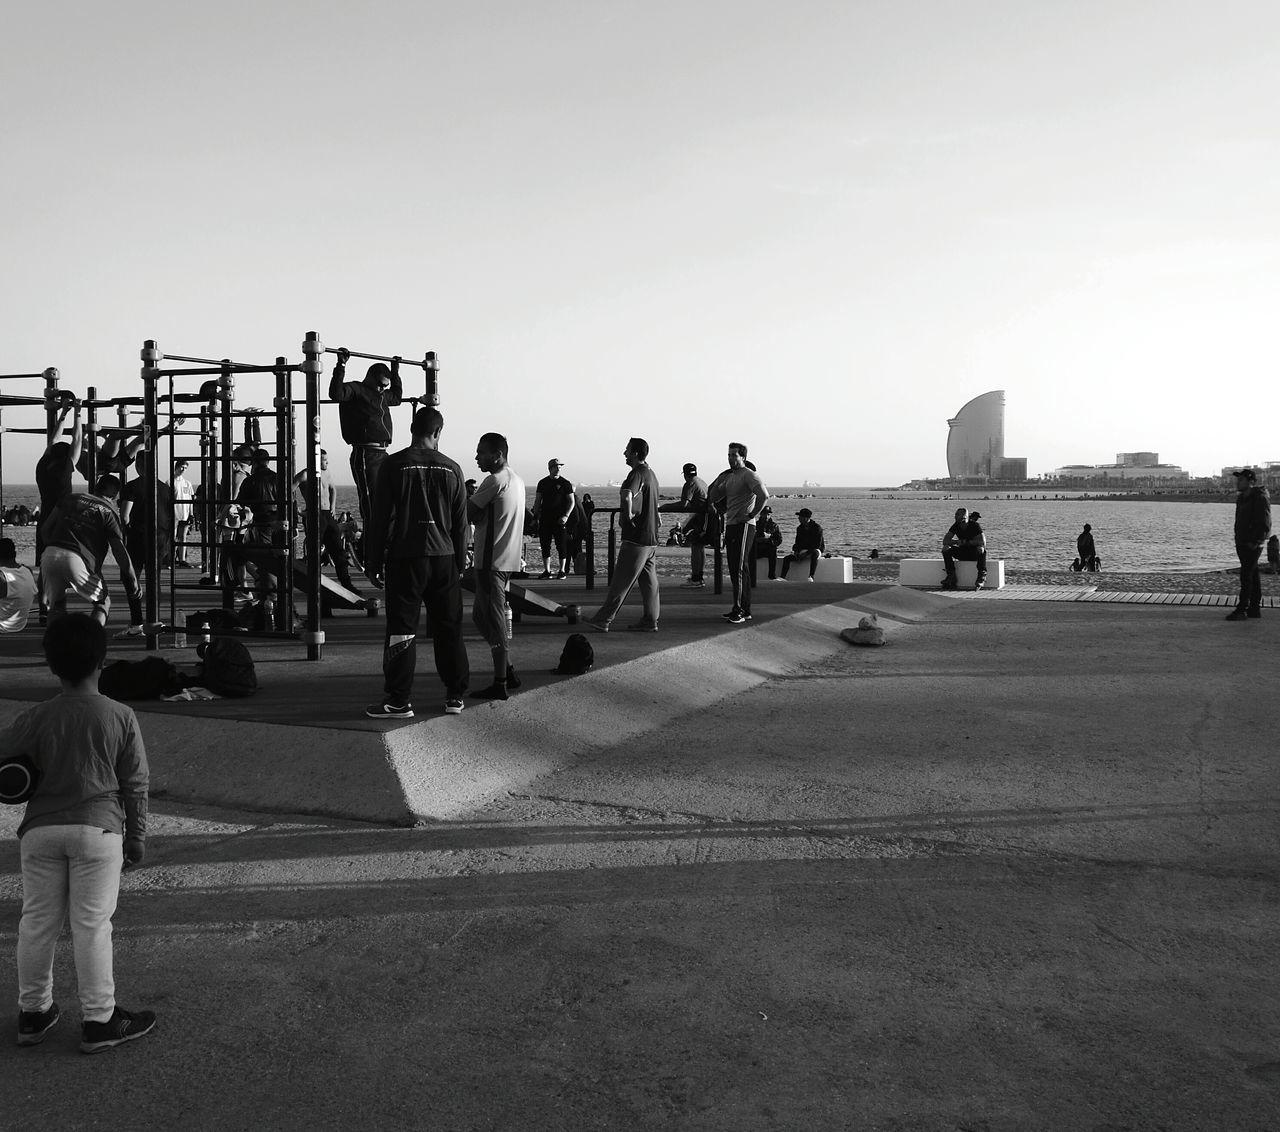 City Outdoors Men Adult Photography Beauty Lifestyles Blackandwhite Kidstaring Weightlifting Barcelona SPAIN Beachphotography EyeEmNewHere